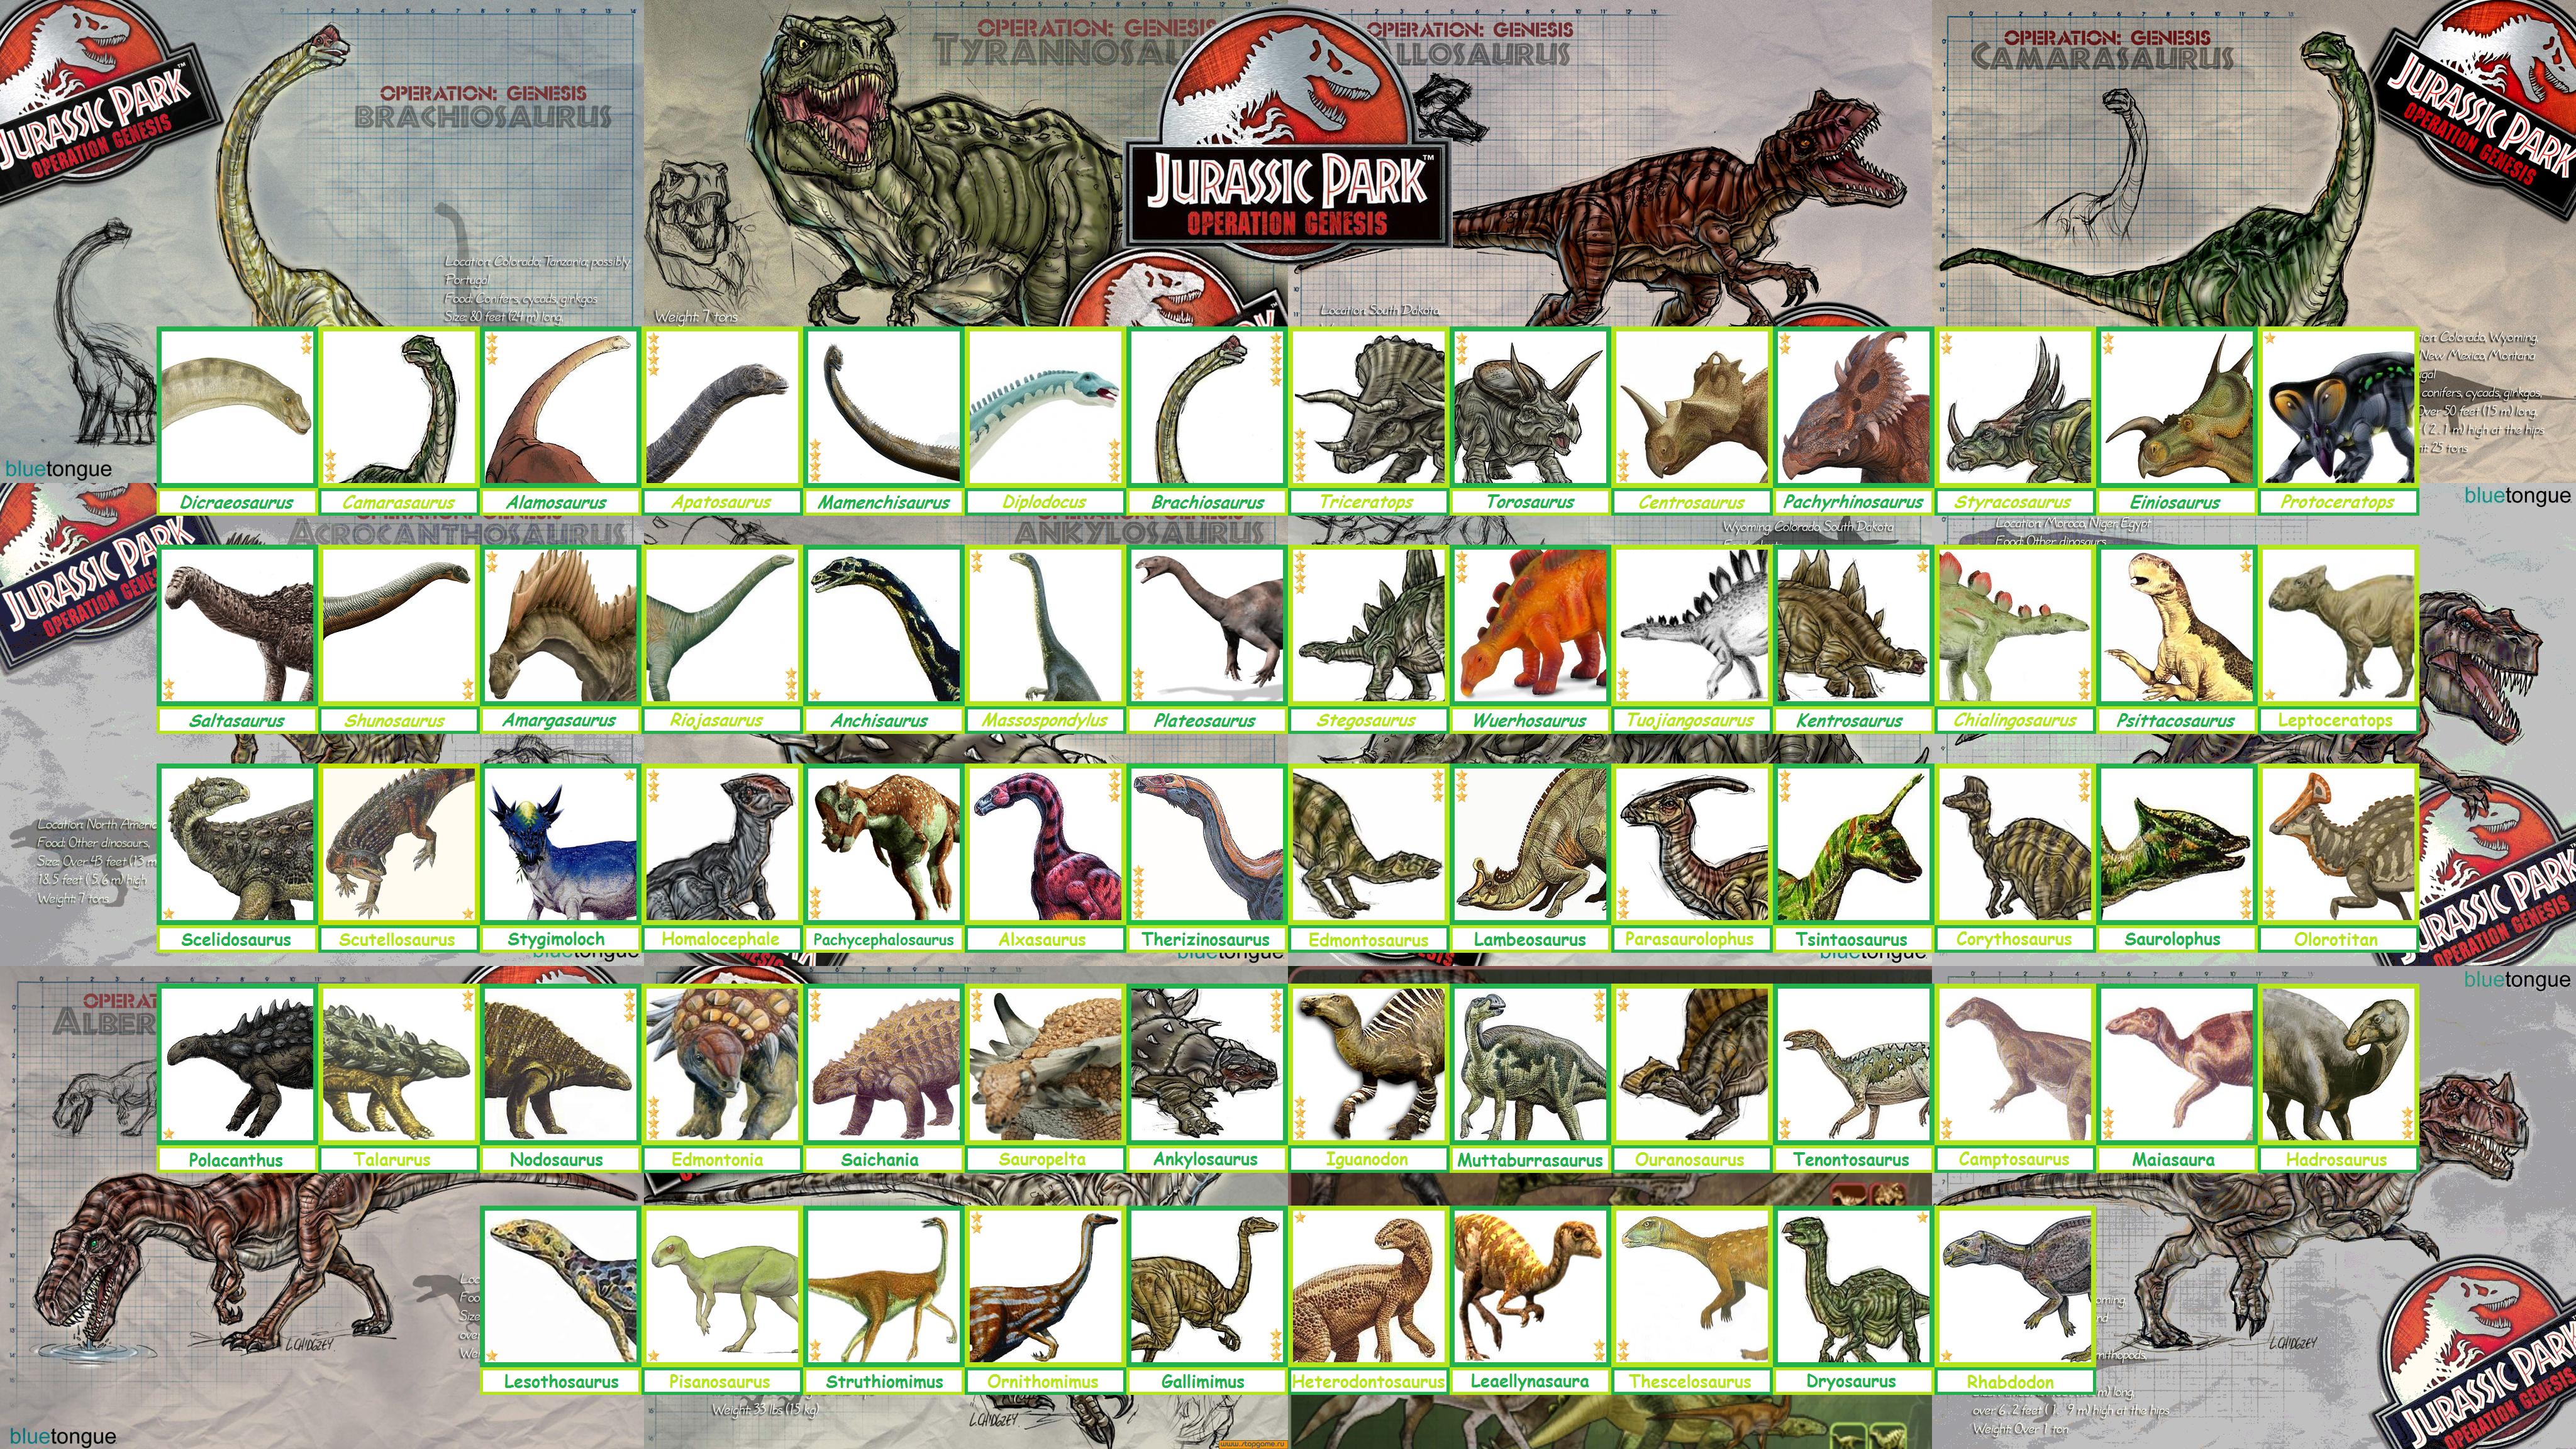 Jurassic Park: Operation Genesis2 - herbivore list by